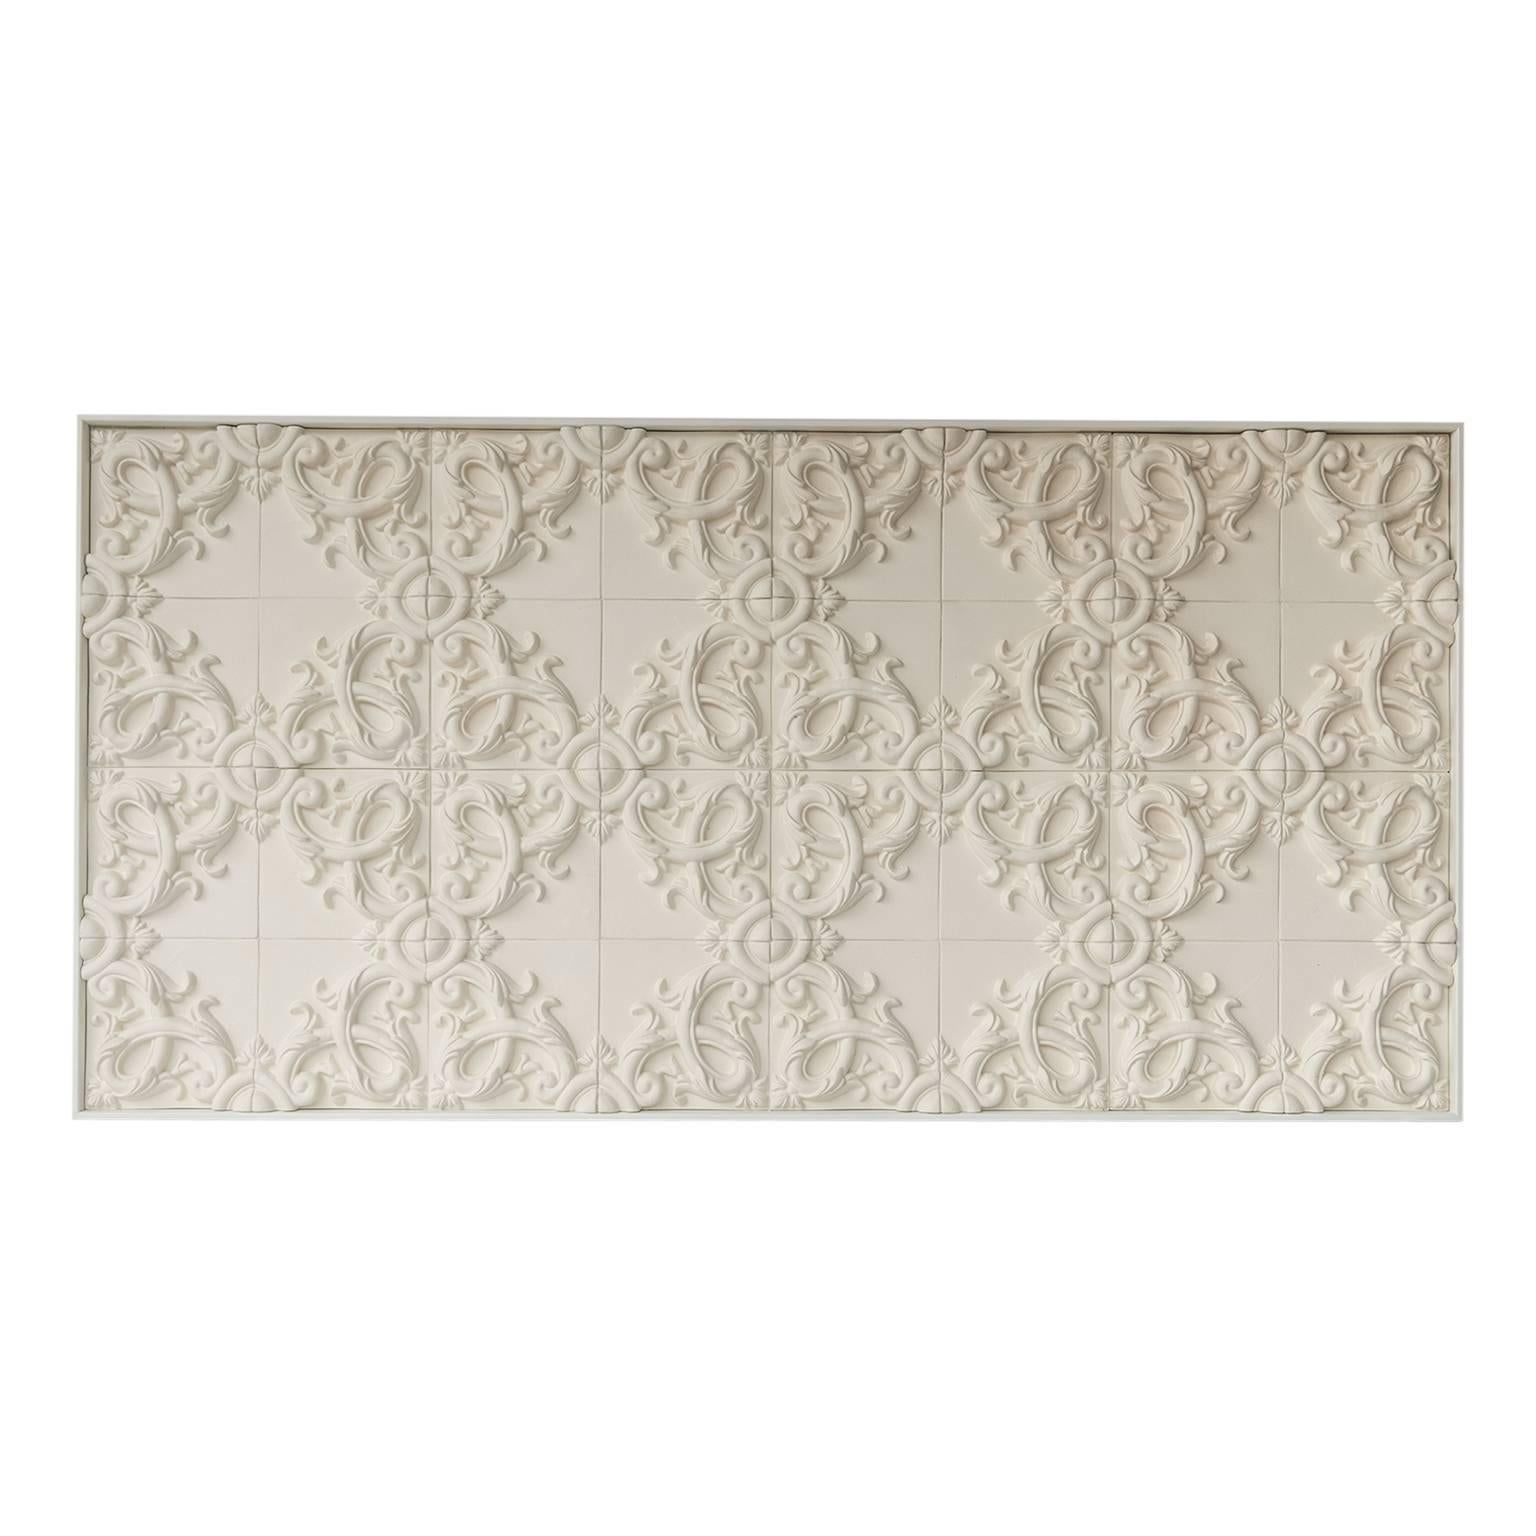 Decorative Panel in Three-Dimensional Baroque Ceramic, Customizable, Acanto